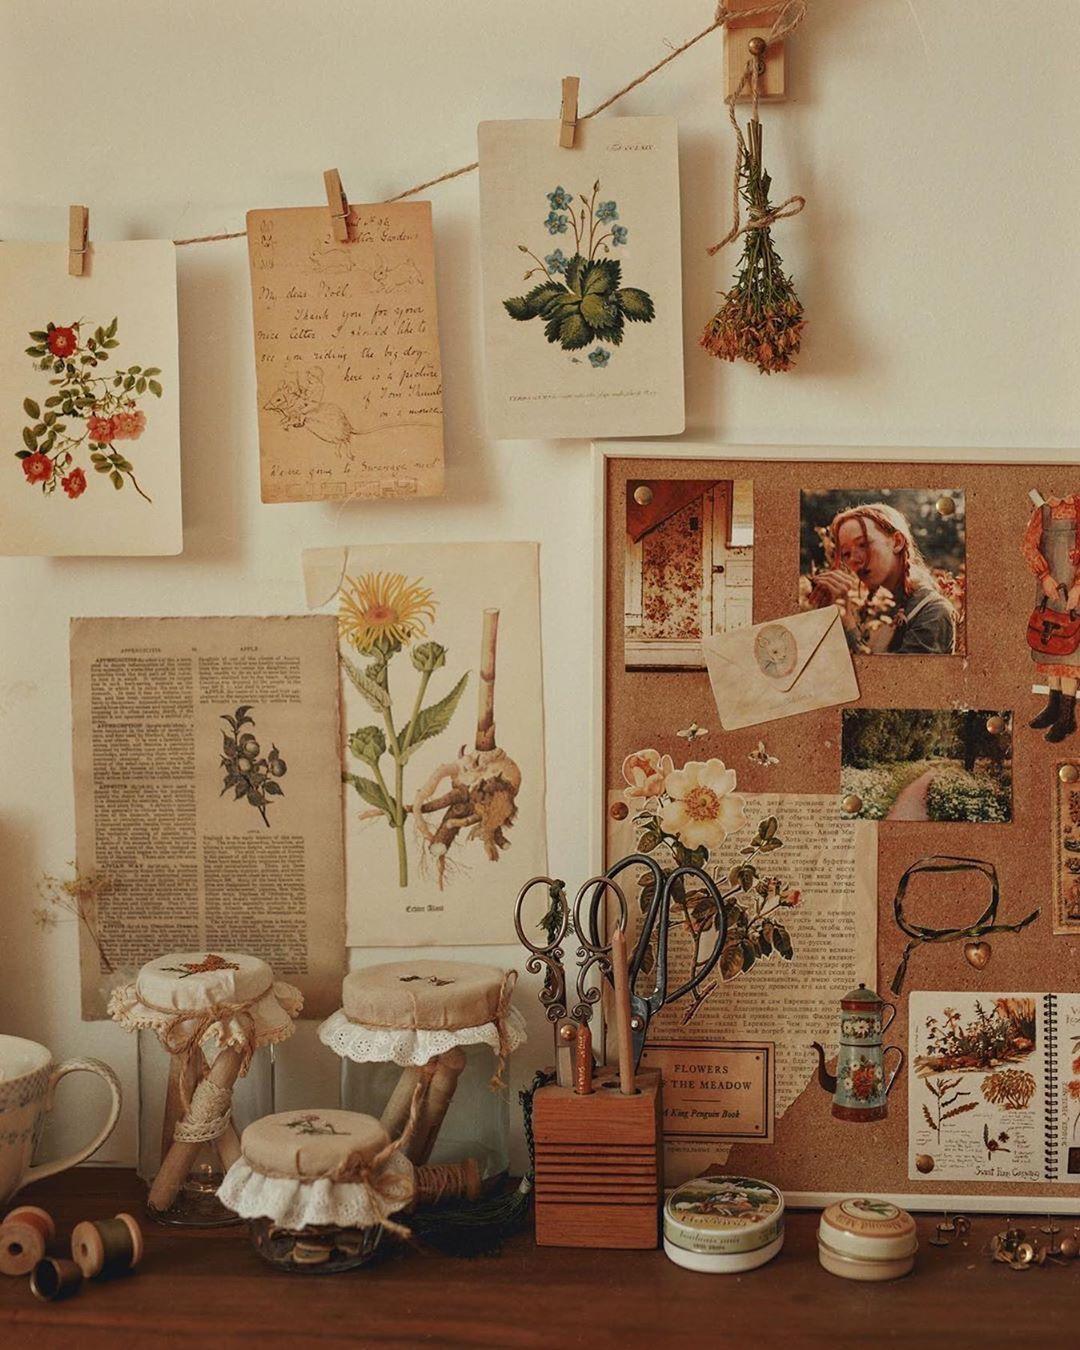 Thelunarspell Sdelal A Publikaciyu V Svoem Akkaunte Instagram Herbalism Life Credits Da In 2020 Aesthetic Room Decor Room Ideas Bedroom Earthy Home Decor